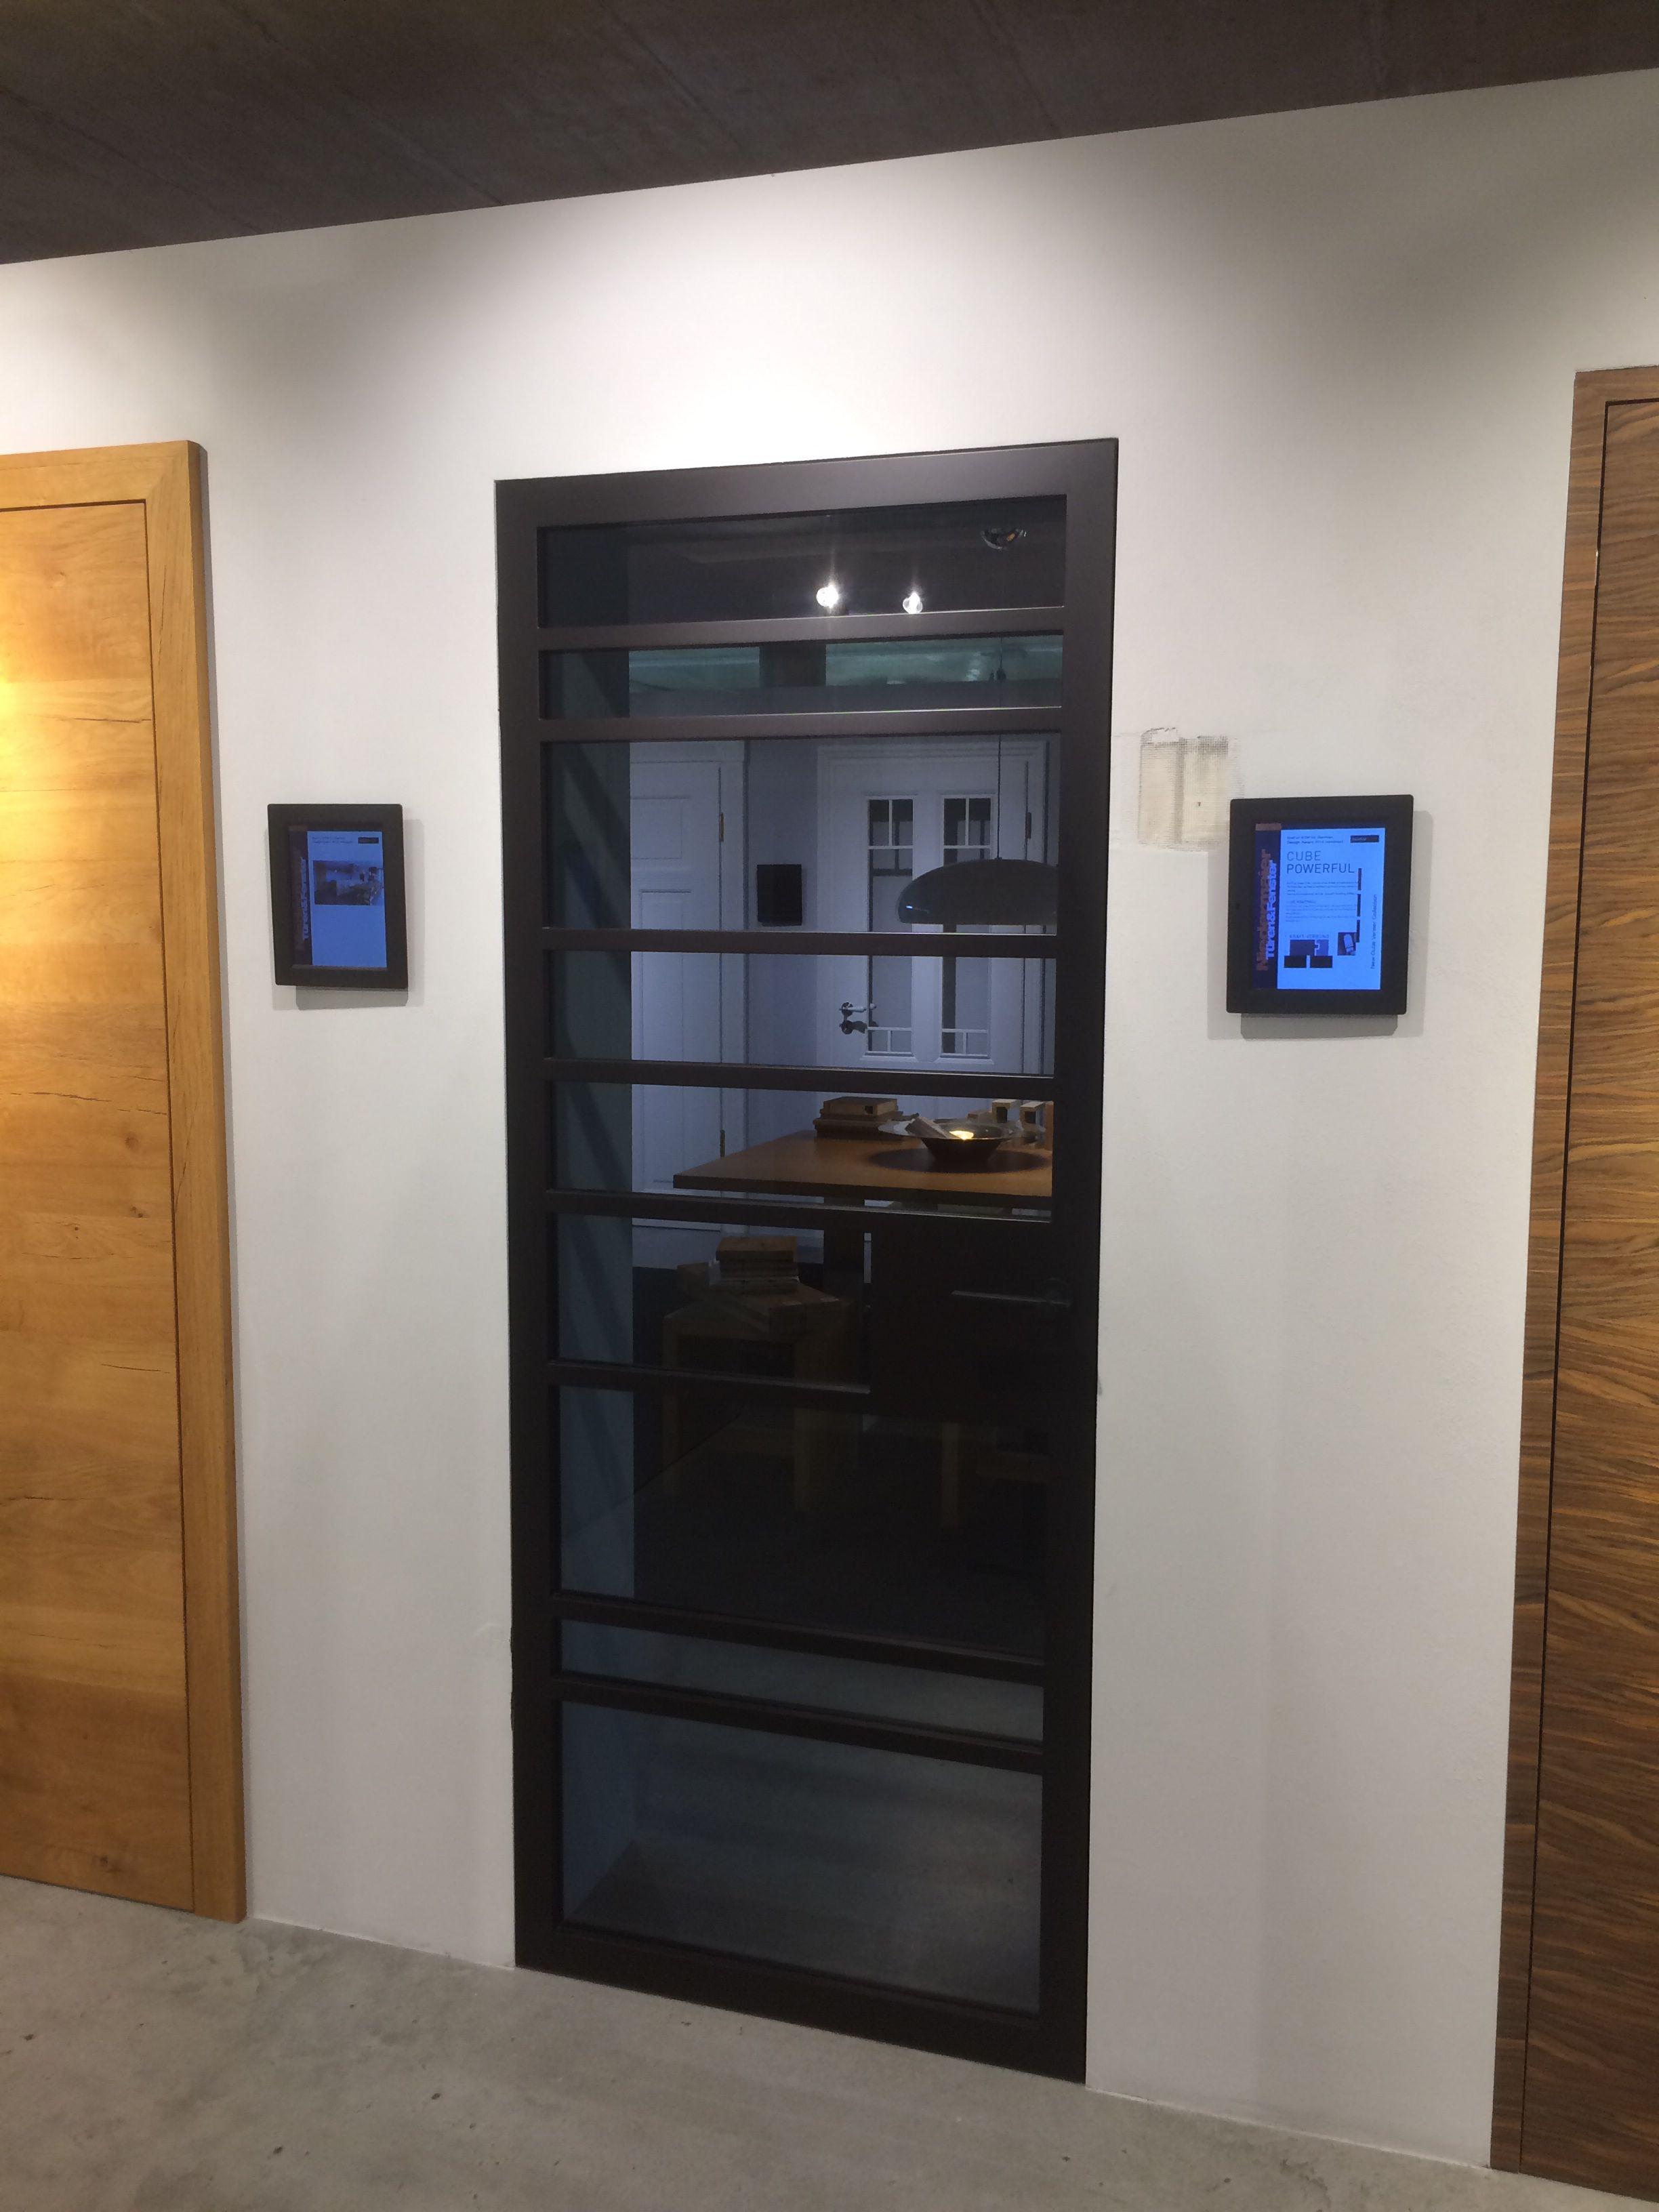 Maxxdoor Der Turenshop Mit Den Guten Ideen Innenturen Zimmertur Glas Haus Deko